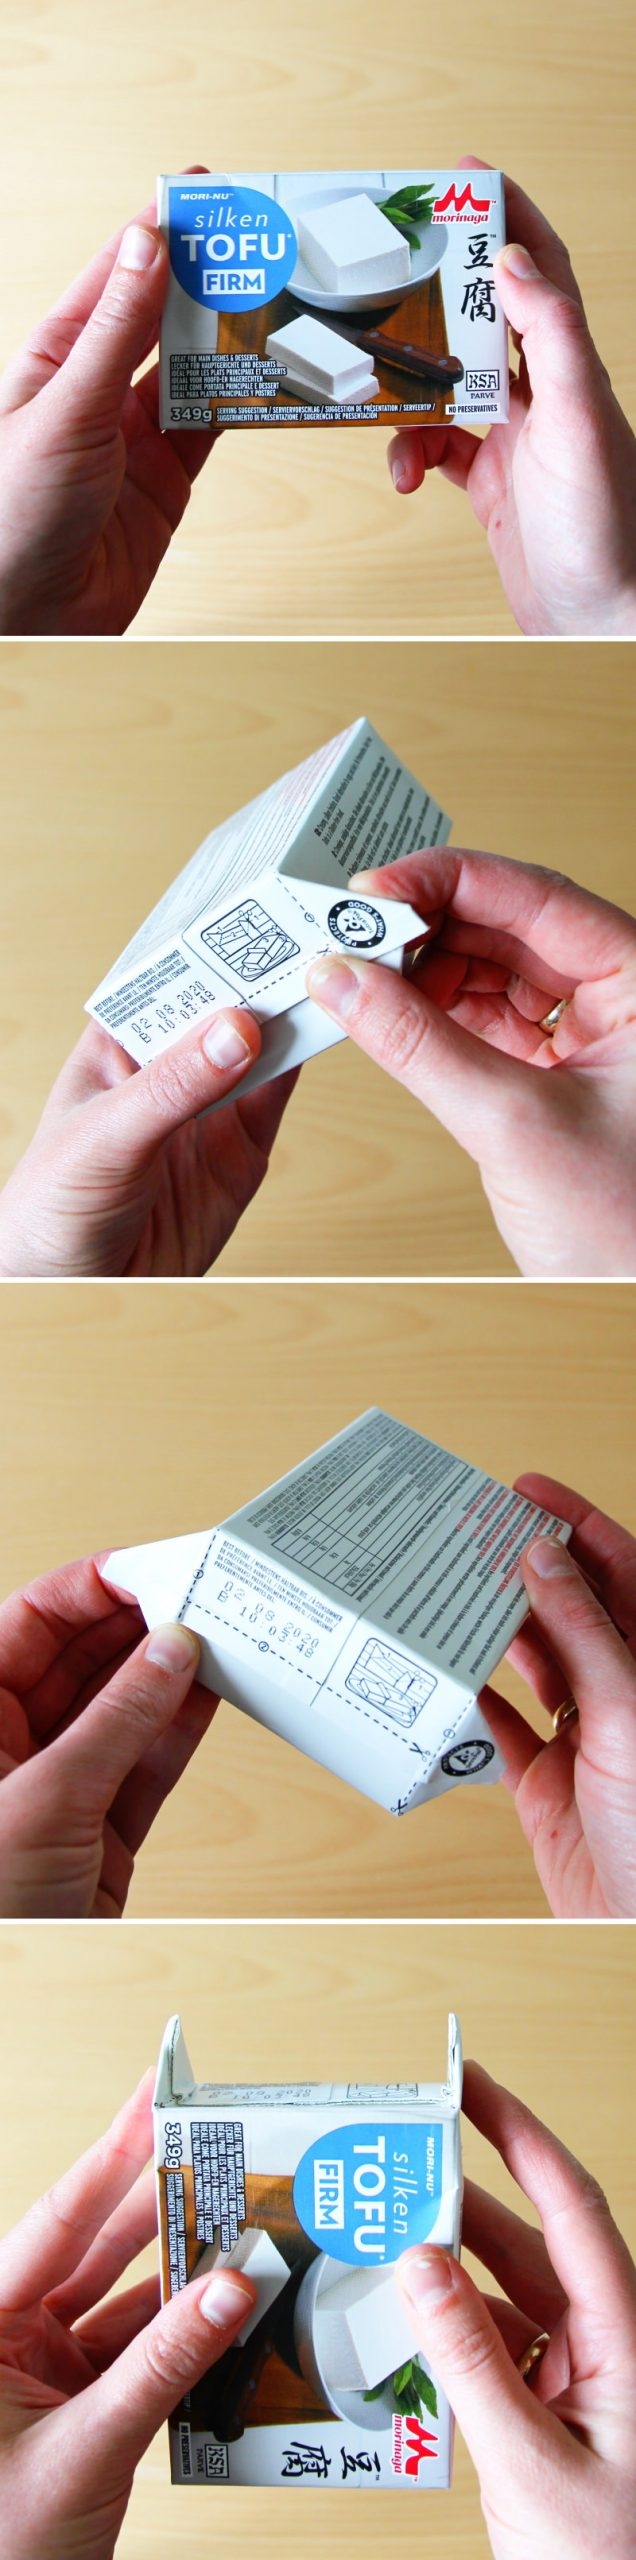 Tofu Verpackung öffnen Schritt 1